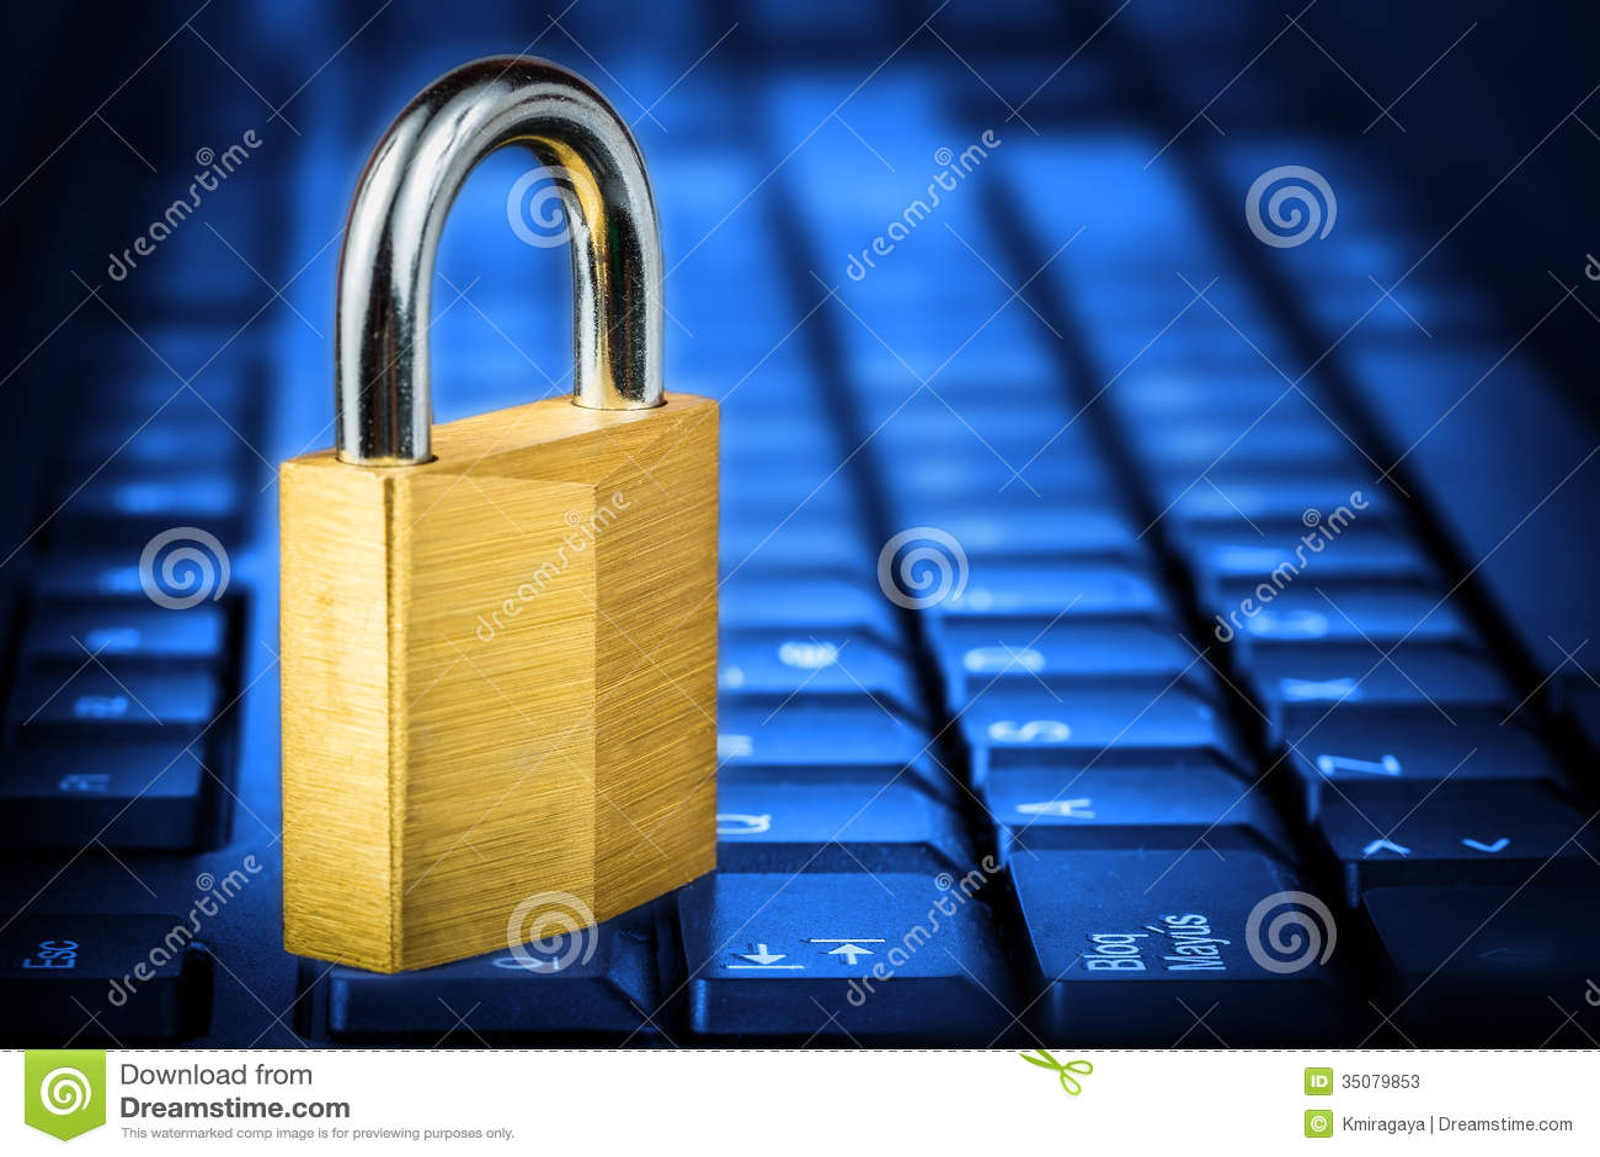 locked padlock om a glowing blue computer keyboard stock